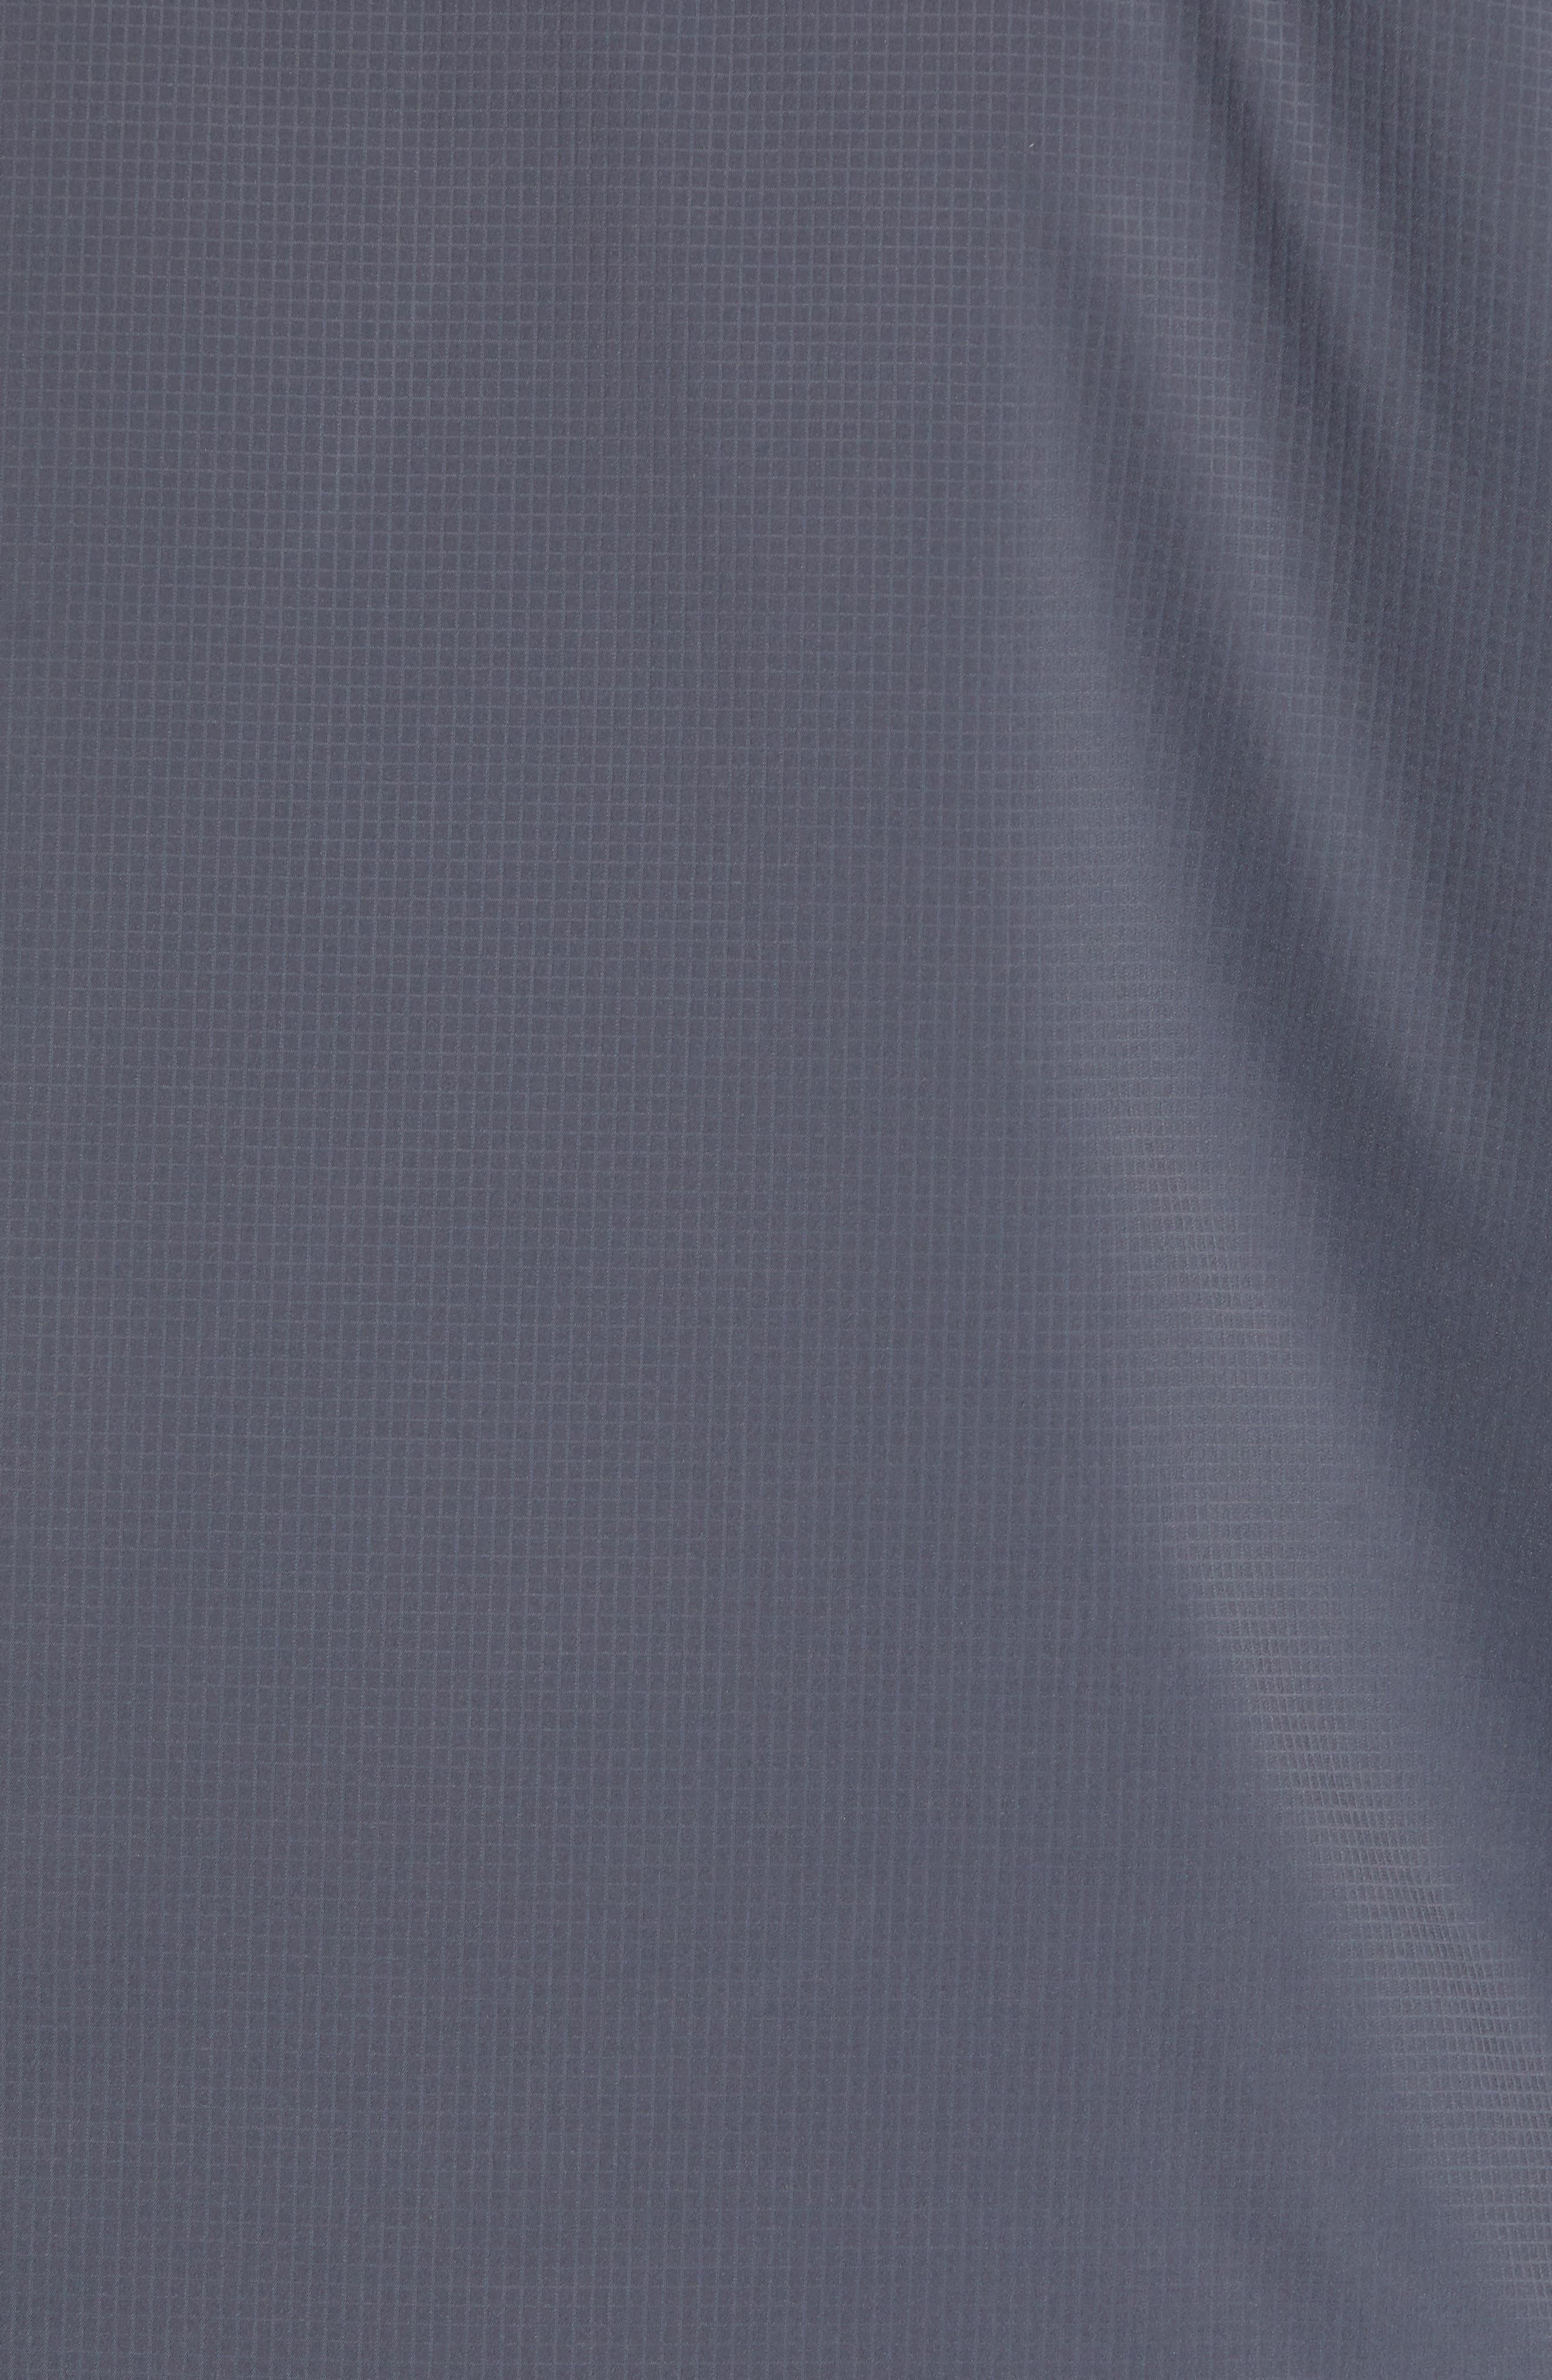 Ventrix Water Resistant Ripstop Jacket,                             Alternate thumbnail 7, color,                             VANADIS GREY/ VANADIS GREY